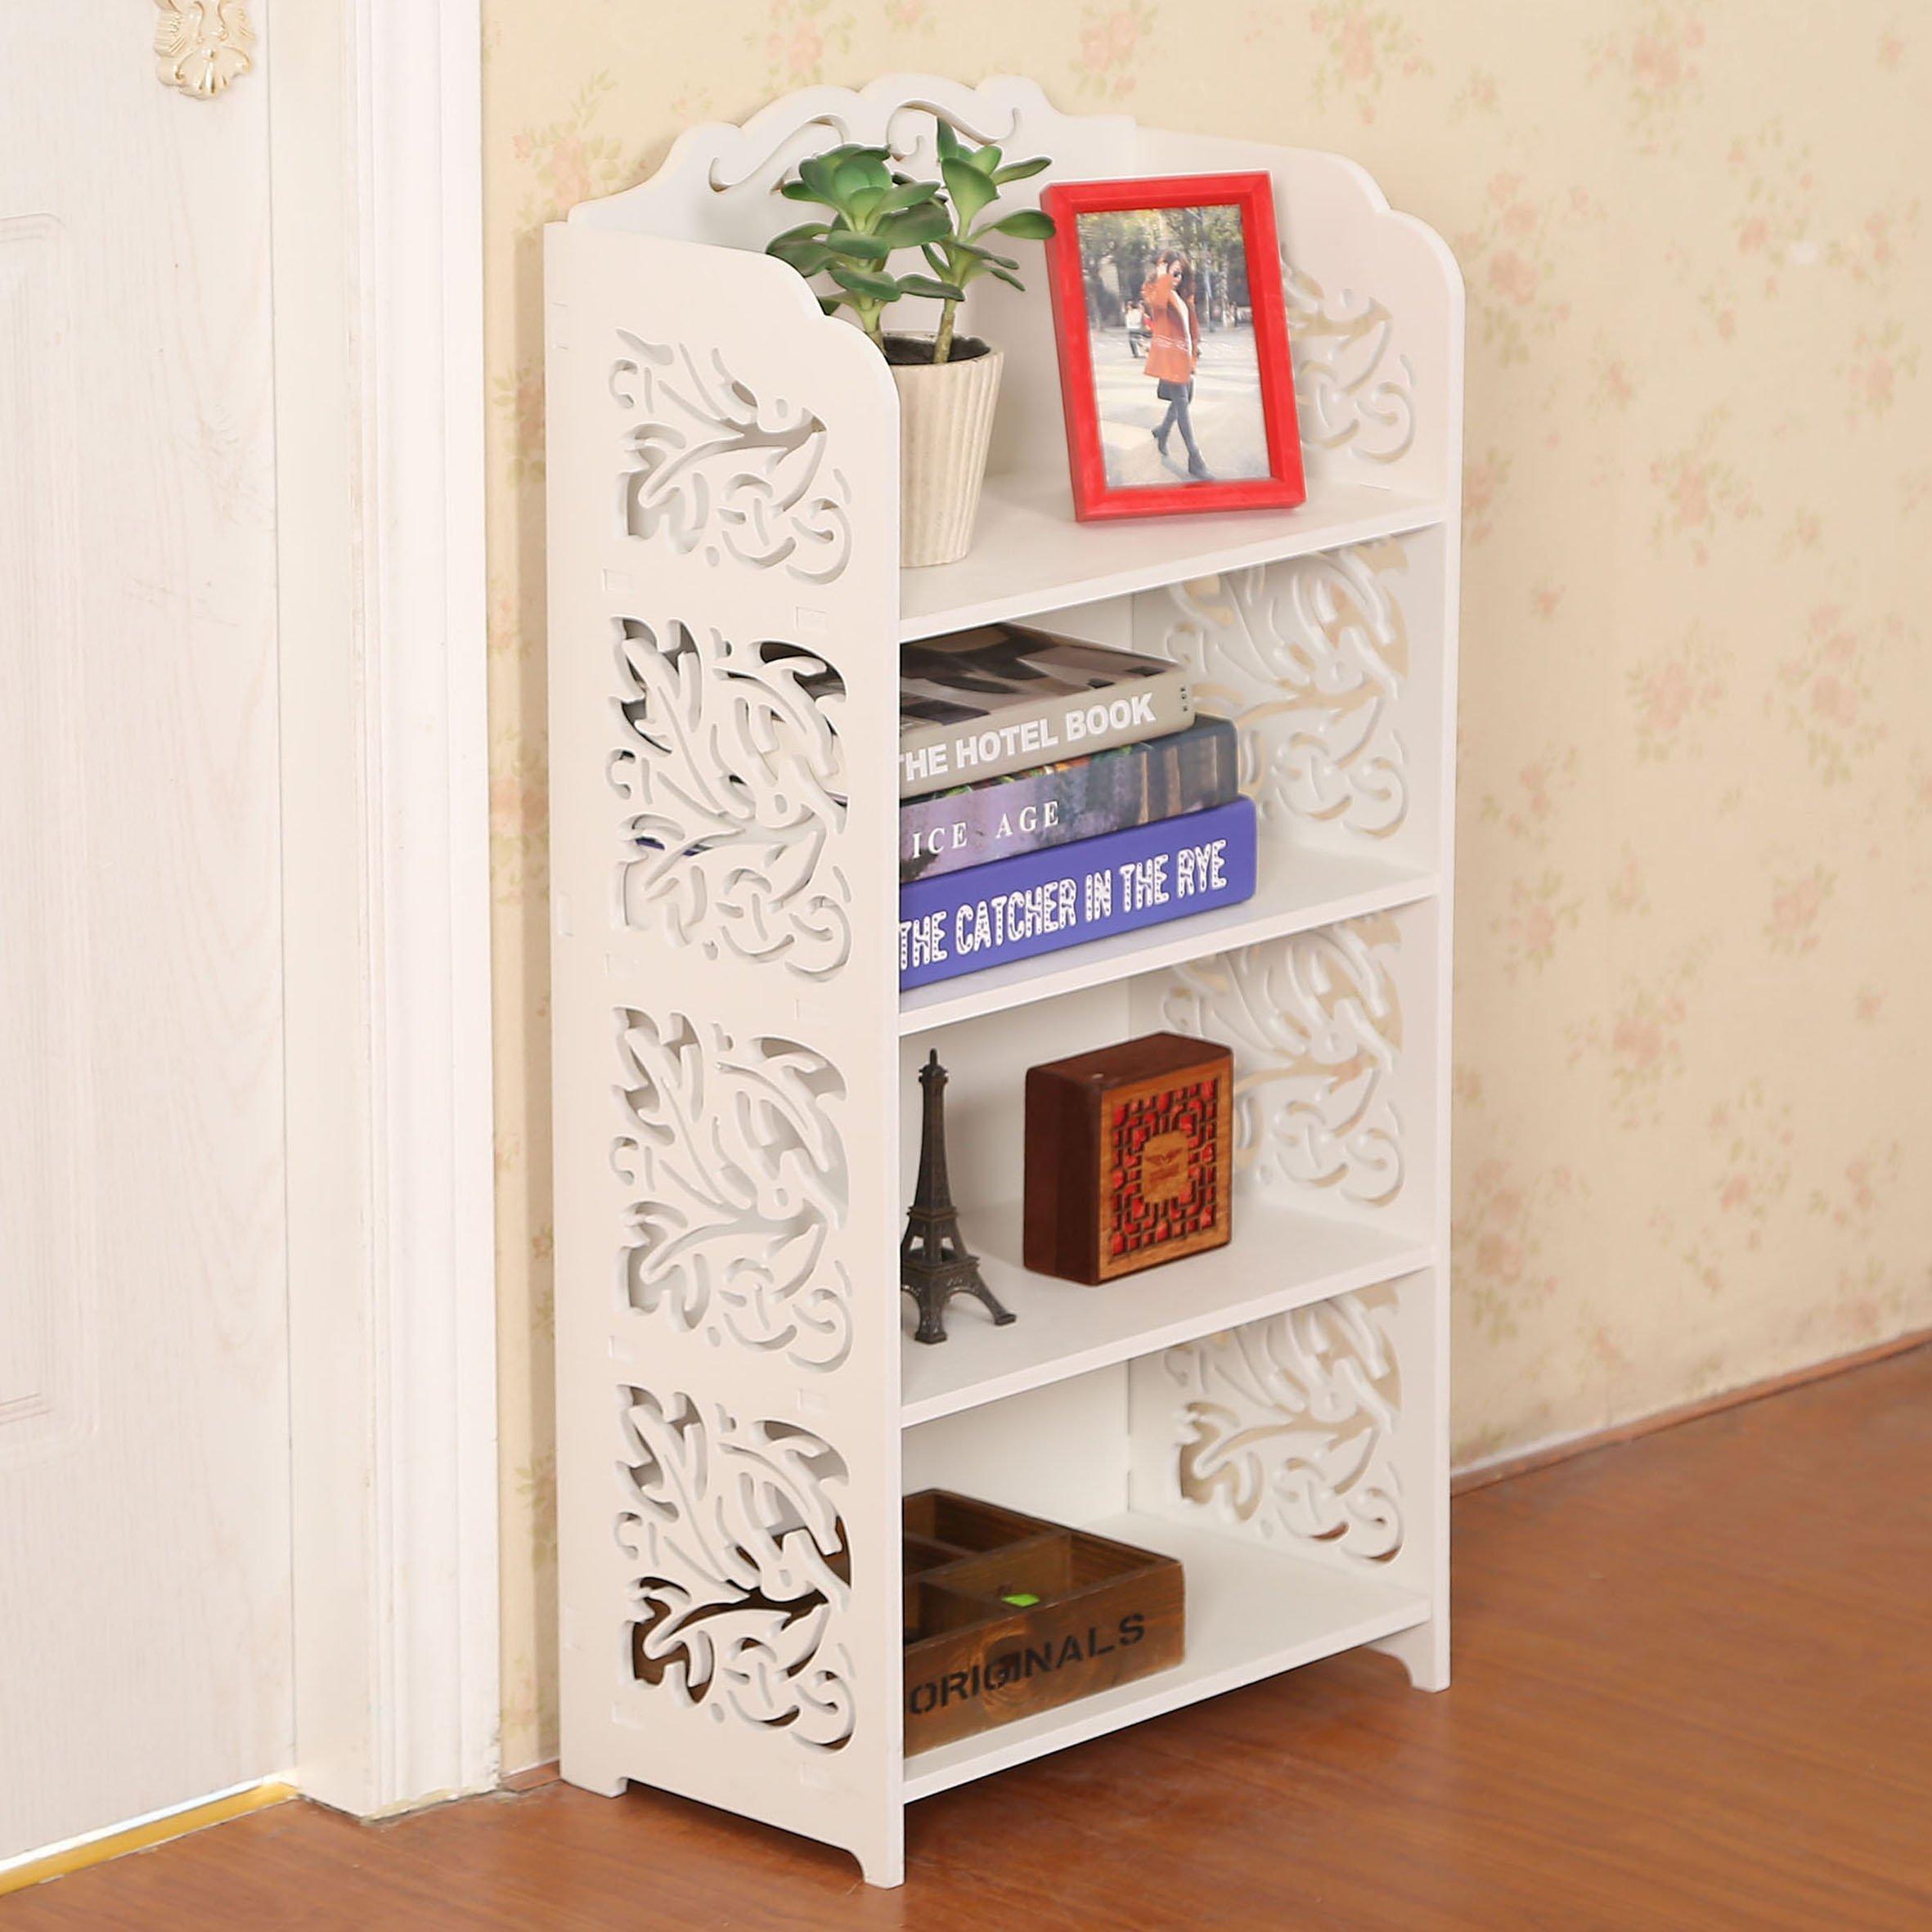 Dline - 4 Tiers Wood-Plastic Composites Storage Shelf, White by D-Line